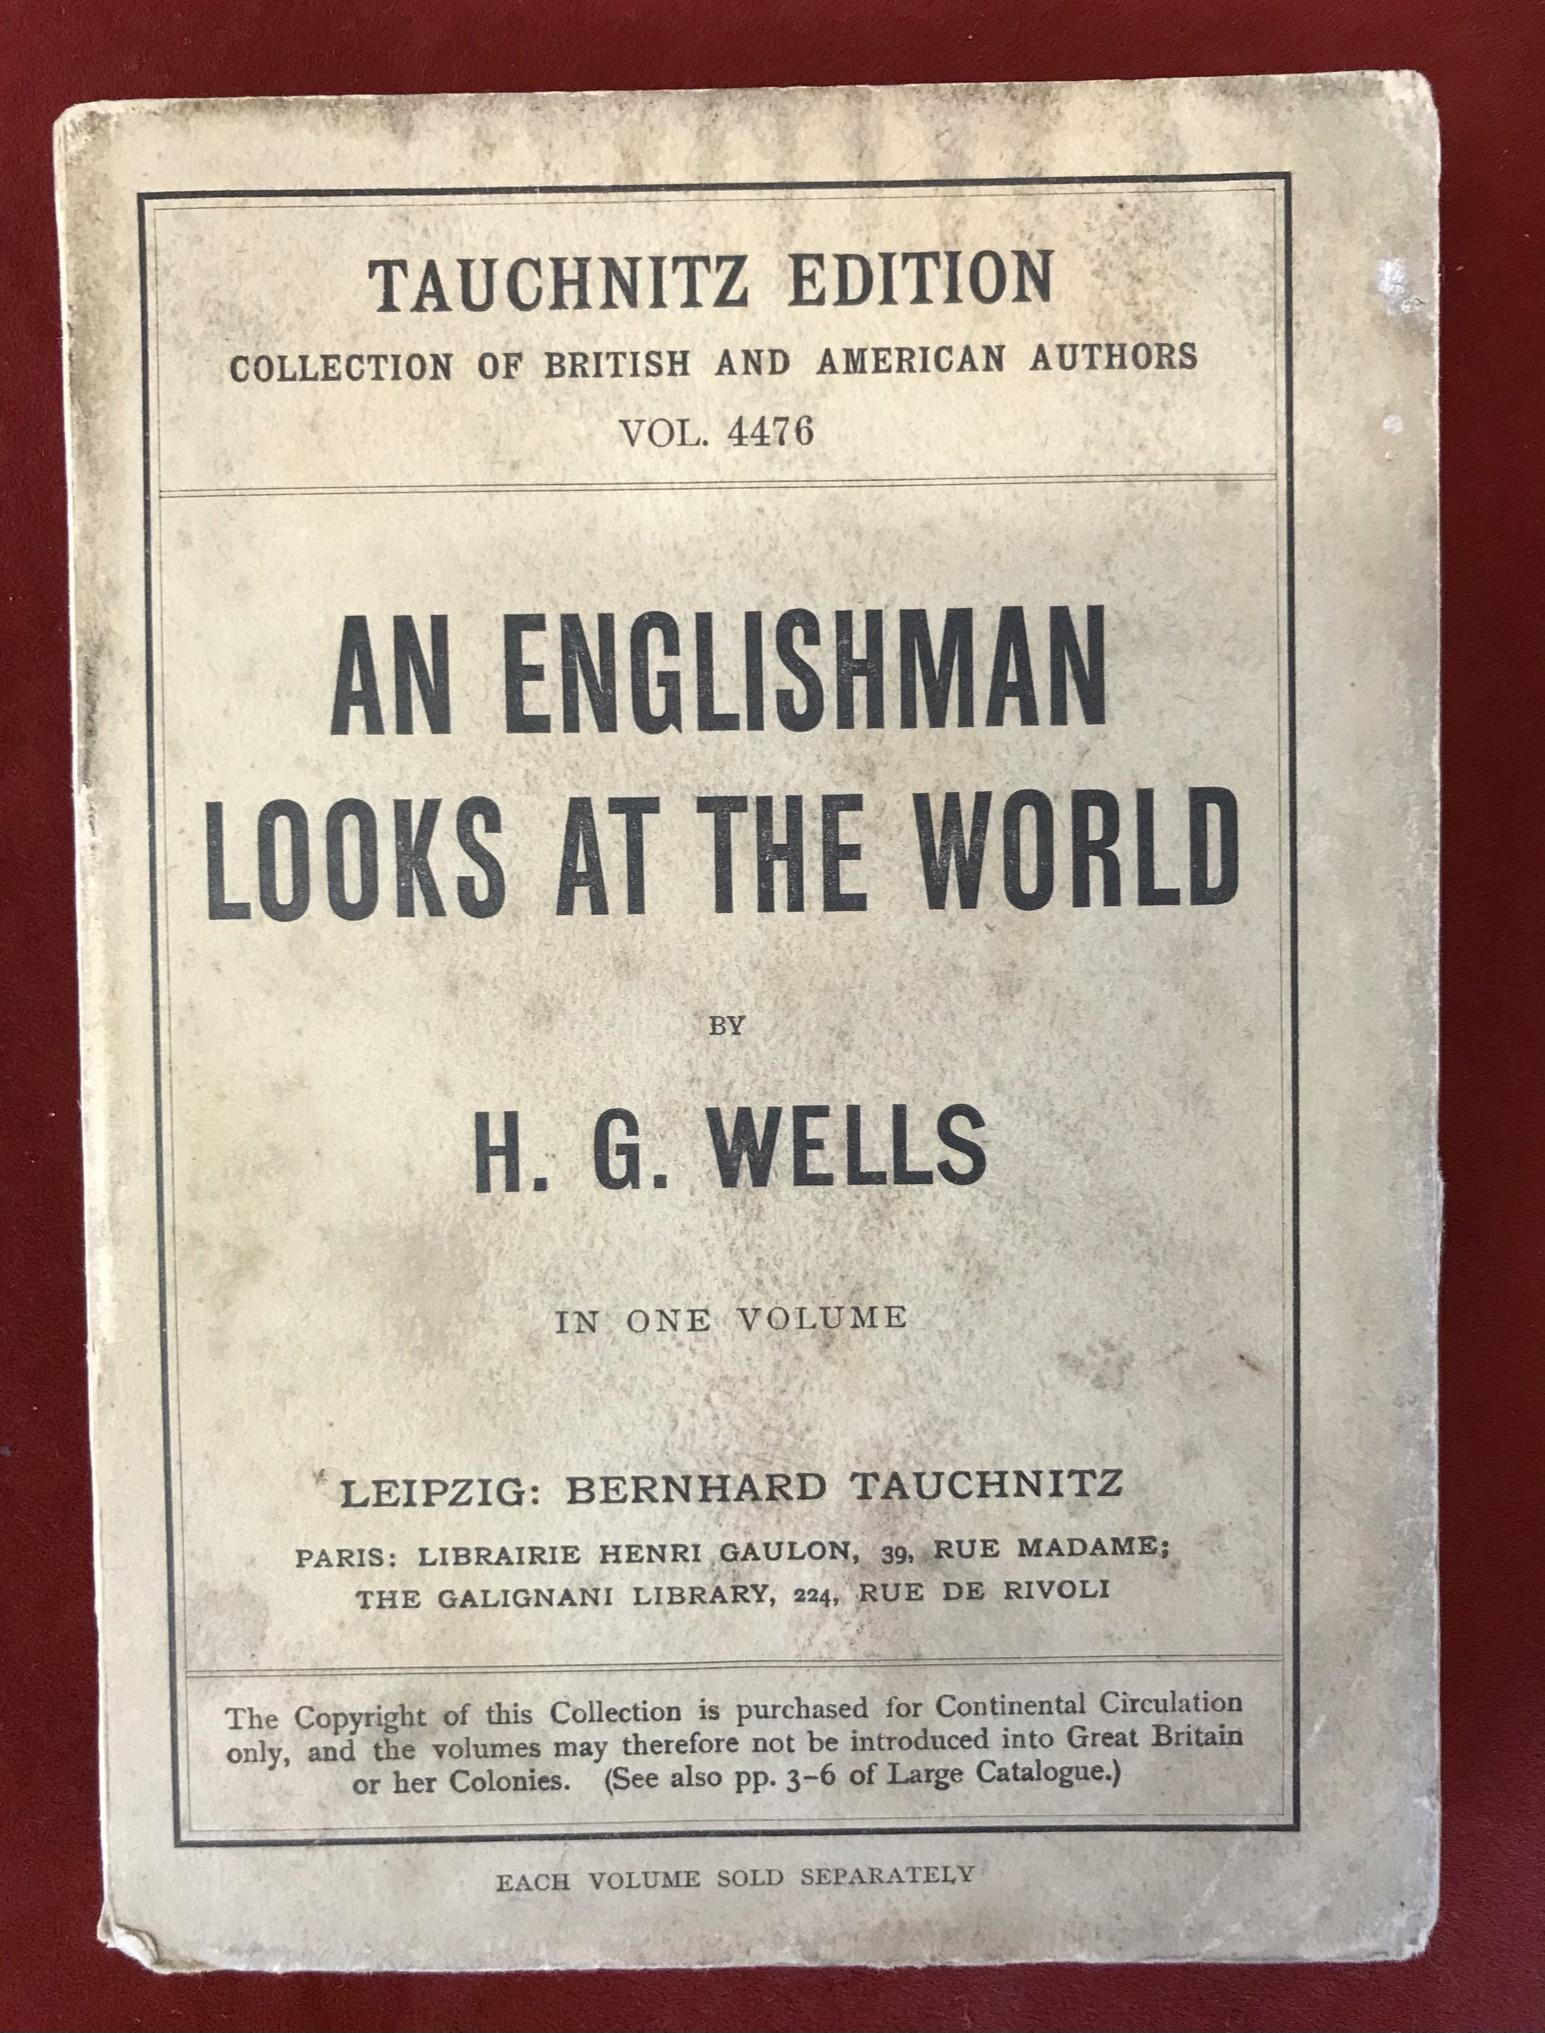 An Englishman Looks at the WorldTauchnitz, 1914